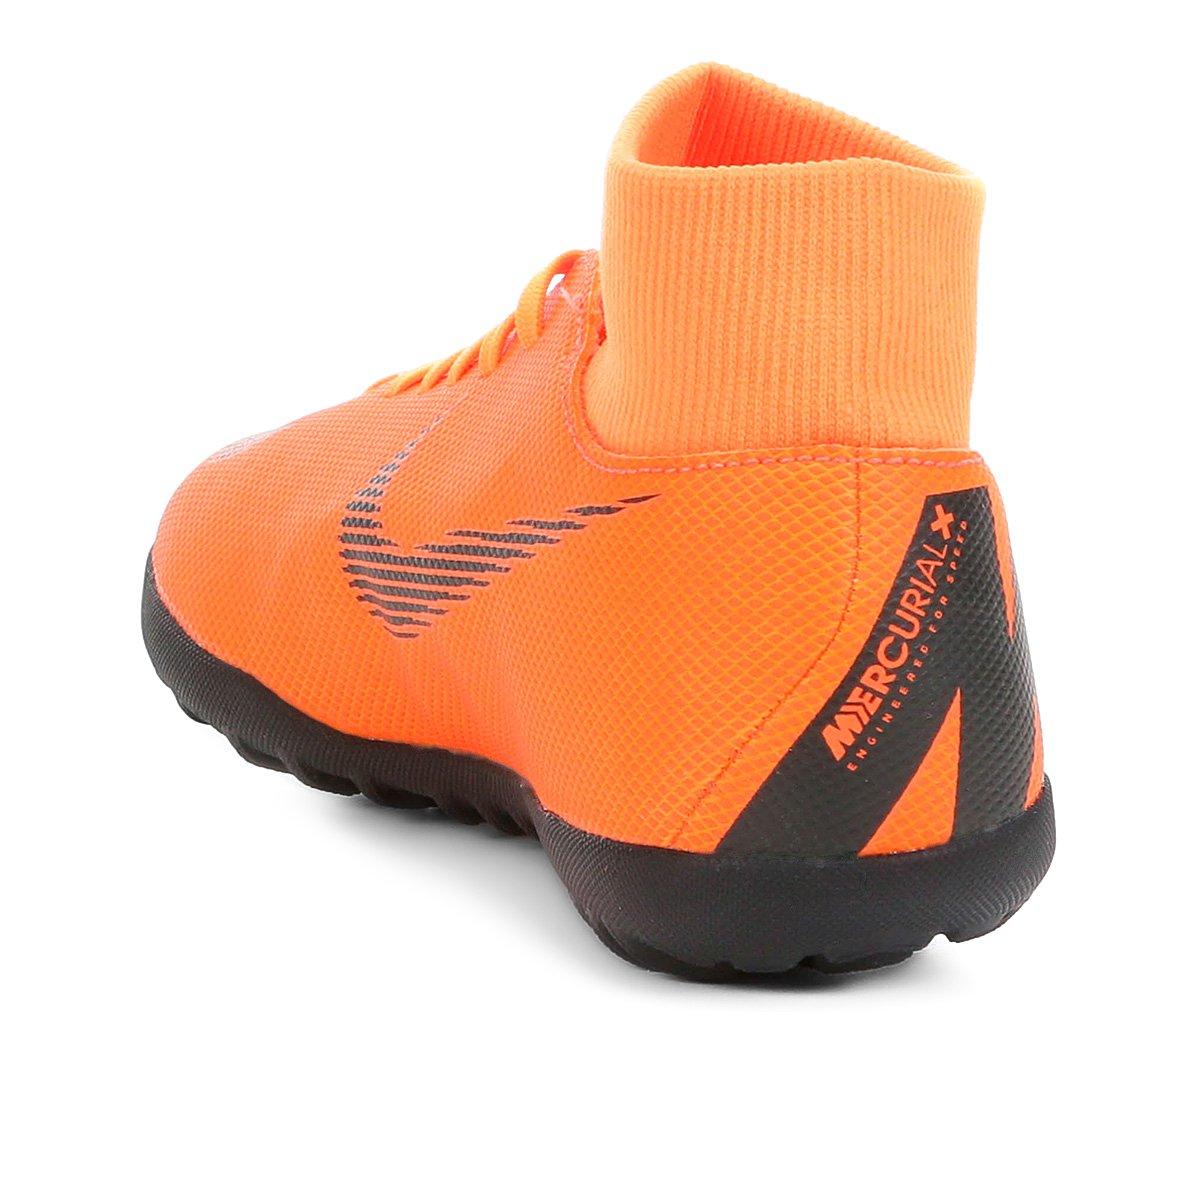 Chuteira Society Nike Mercurial Superfly 6 Club - Laranja e Preto ... 728edcc350359